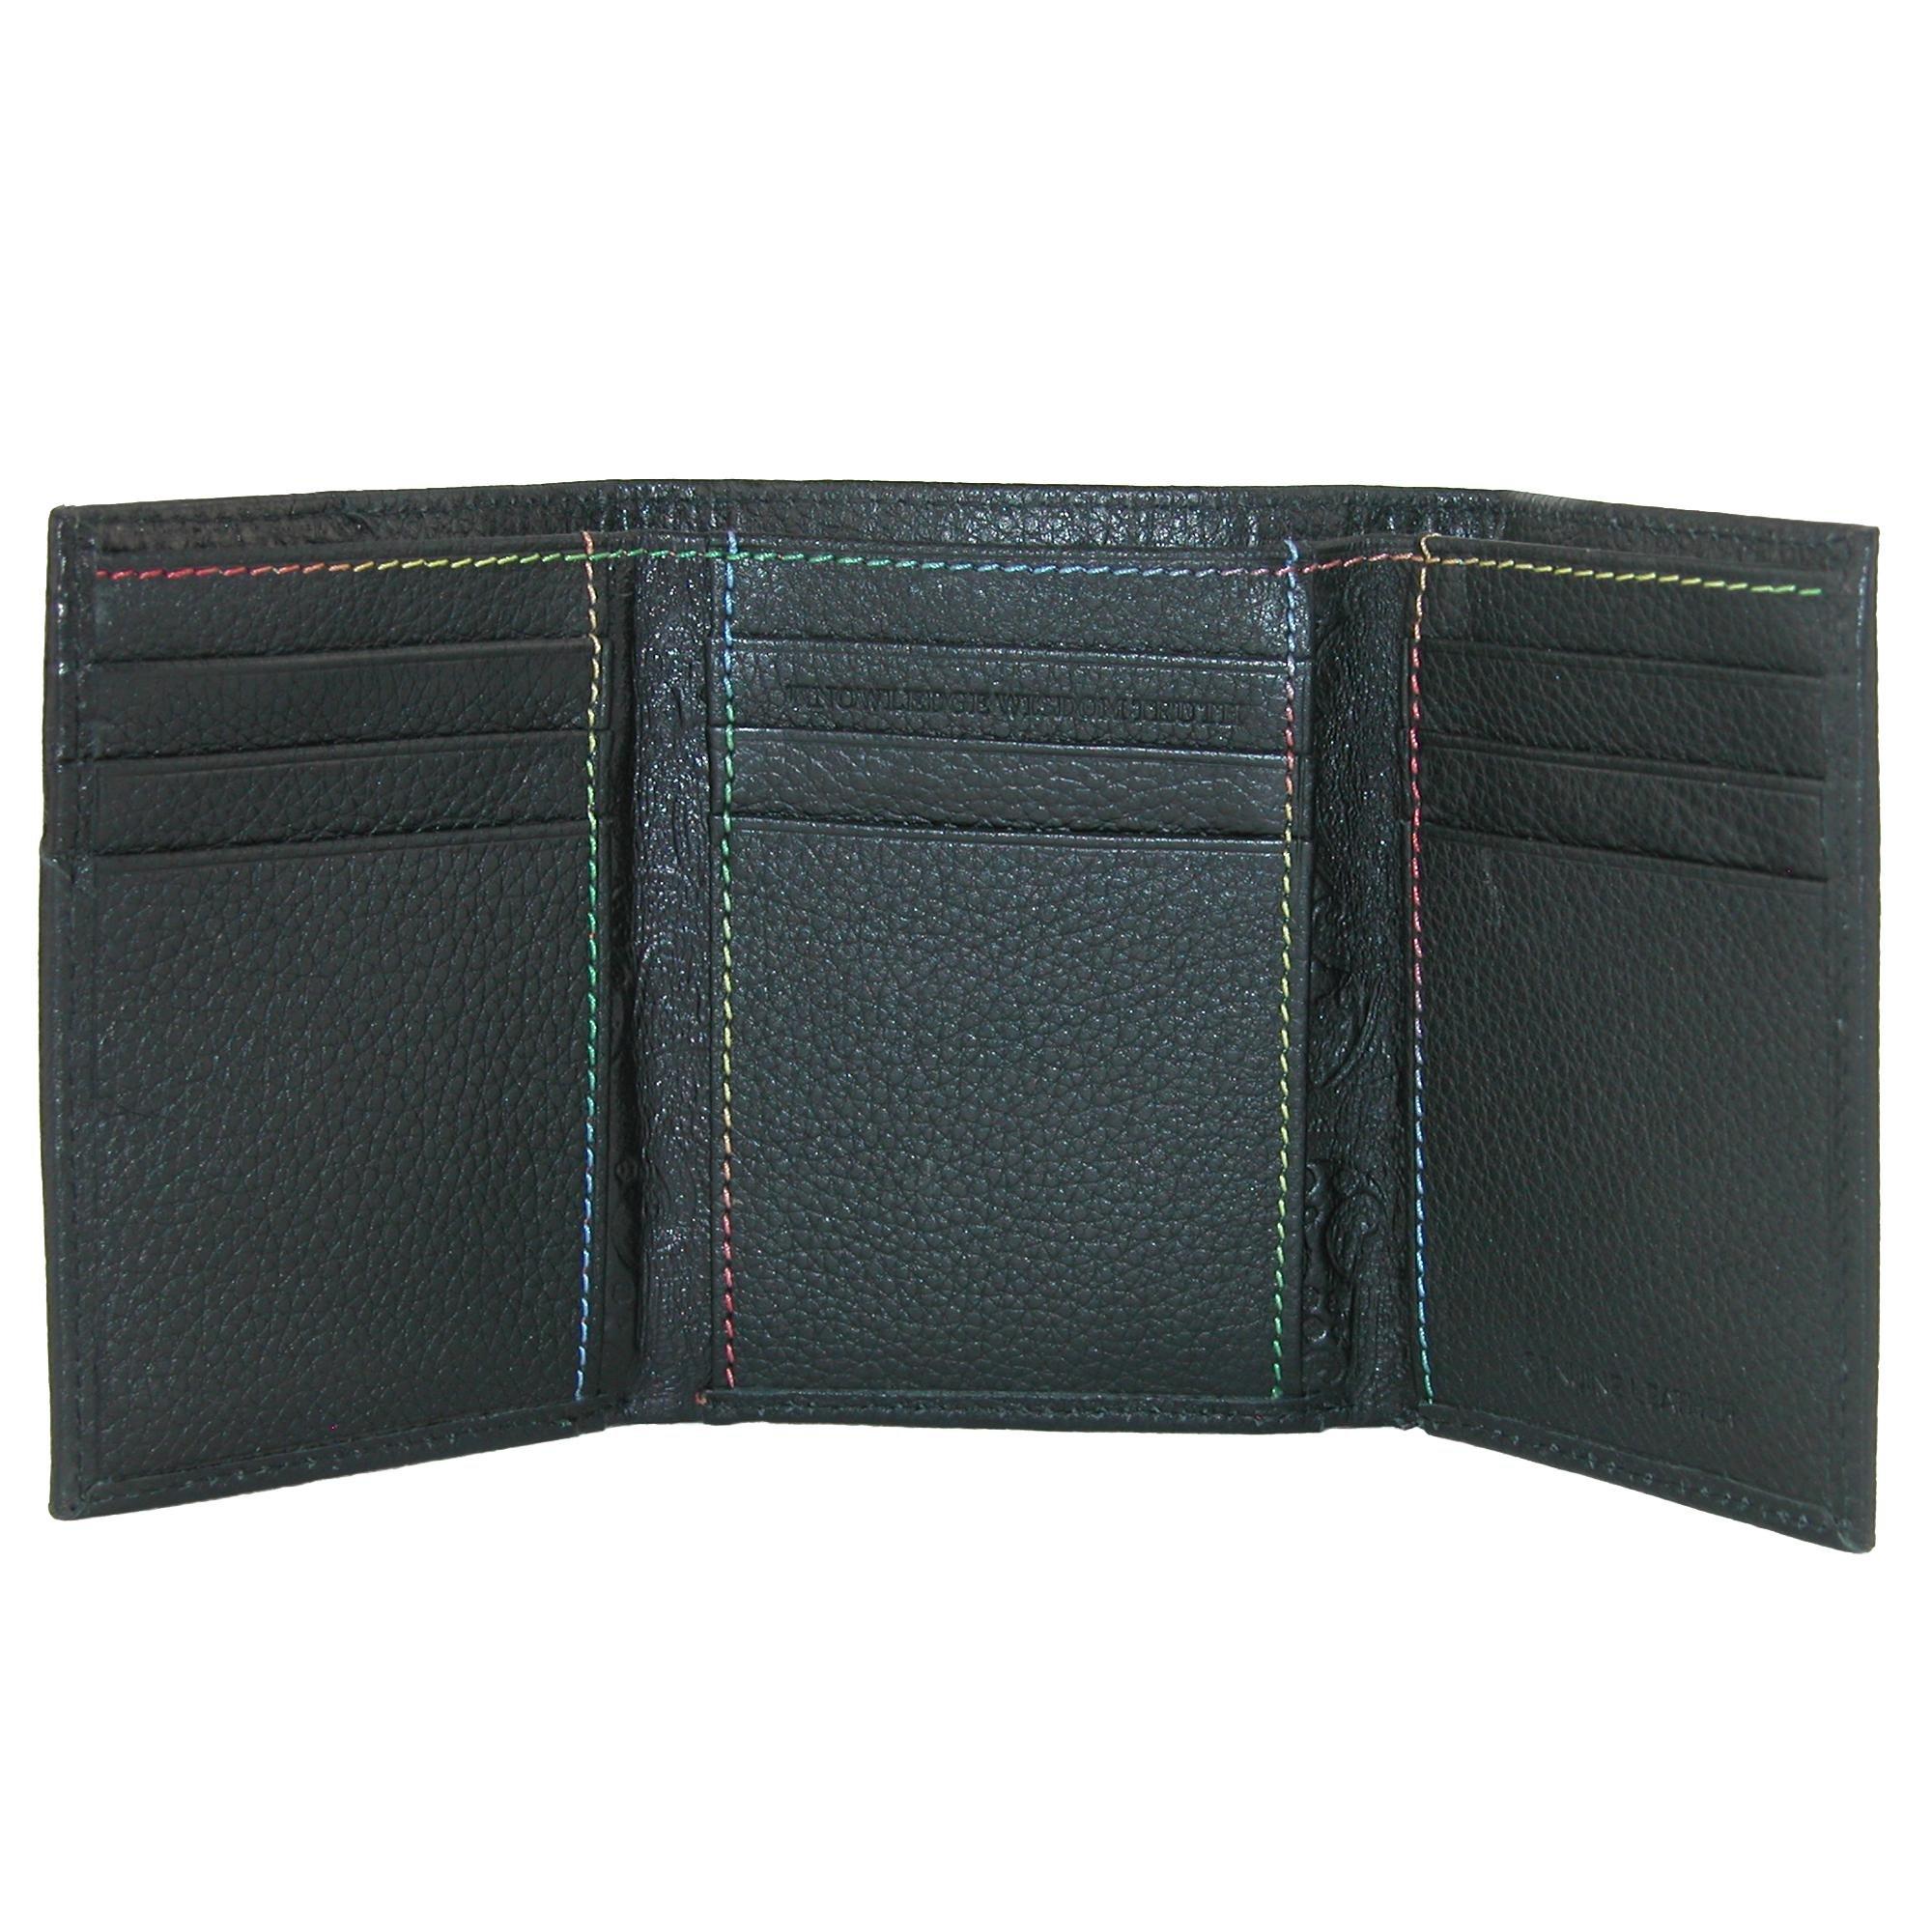 Robert Graham Men's Clarke Trifold Wallet, Black, One Size by Robert Graham (Image #2)